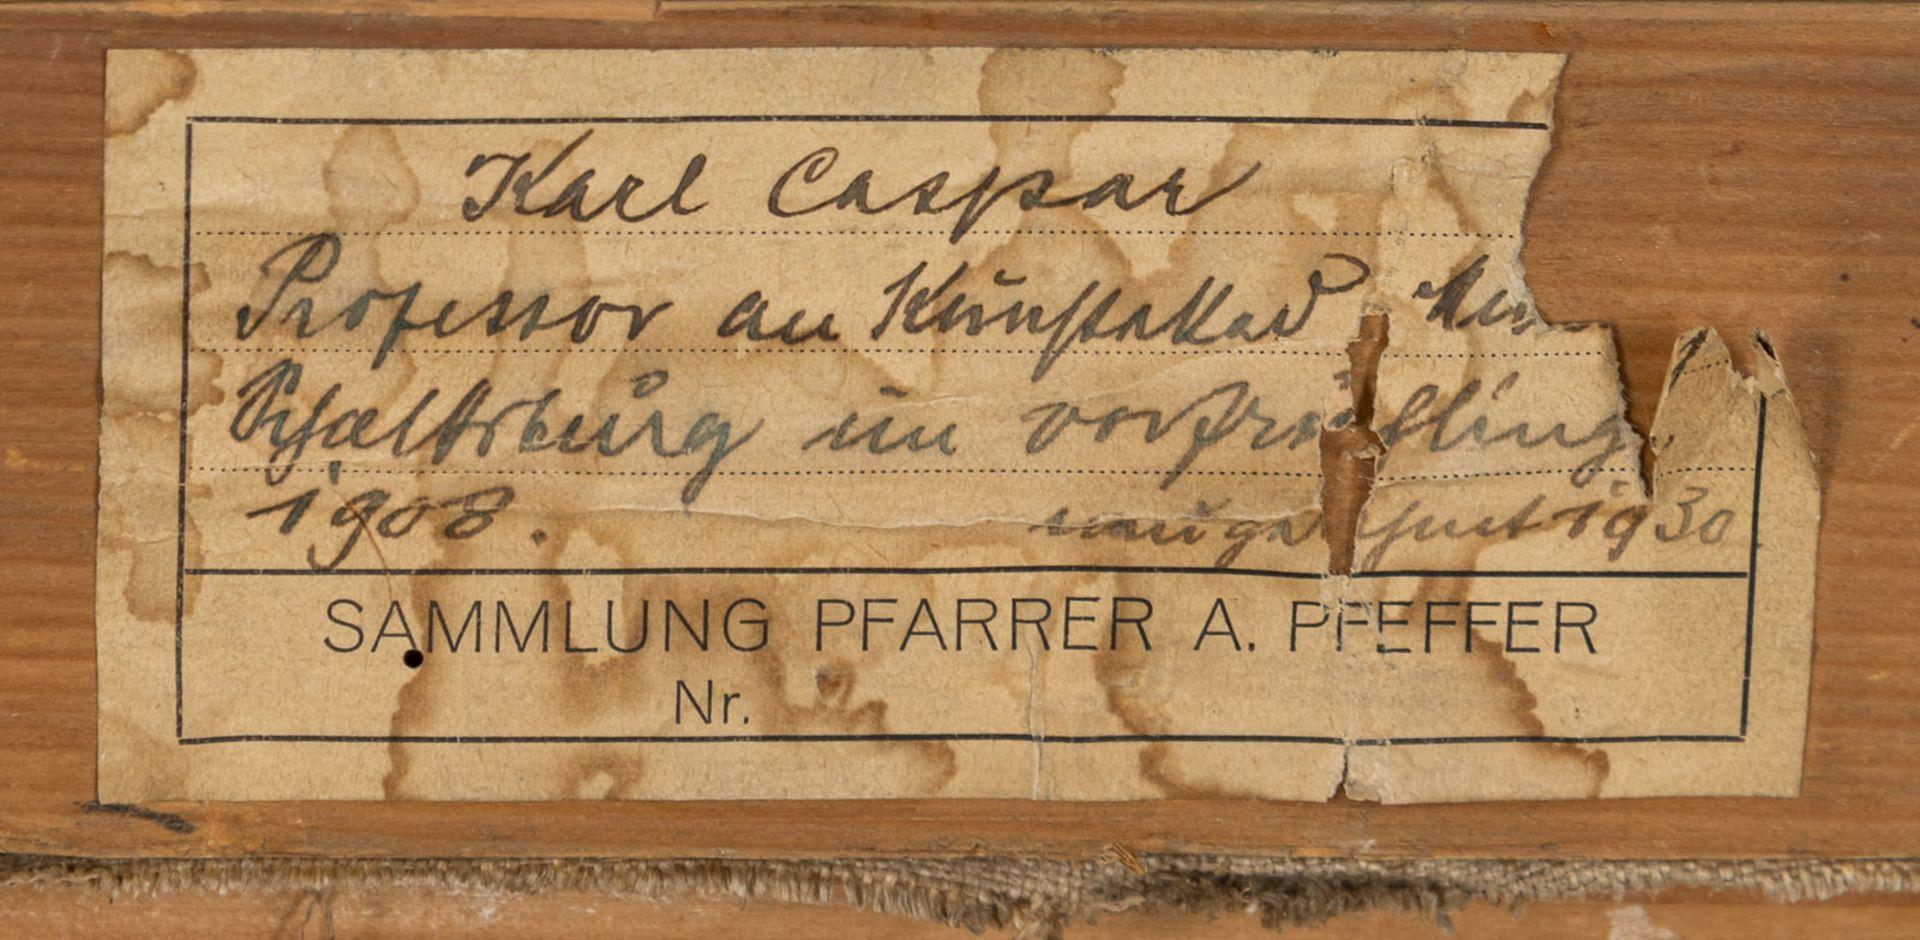 Caspar-Filser, Maria - Image 4 of 4